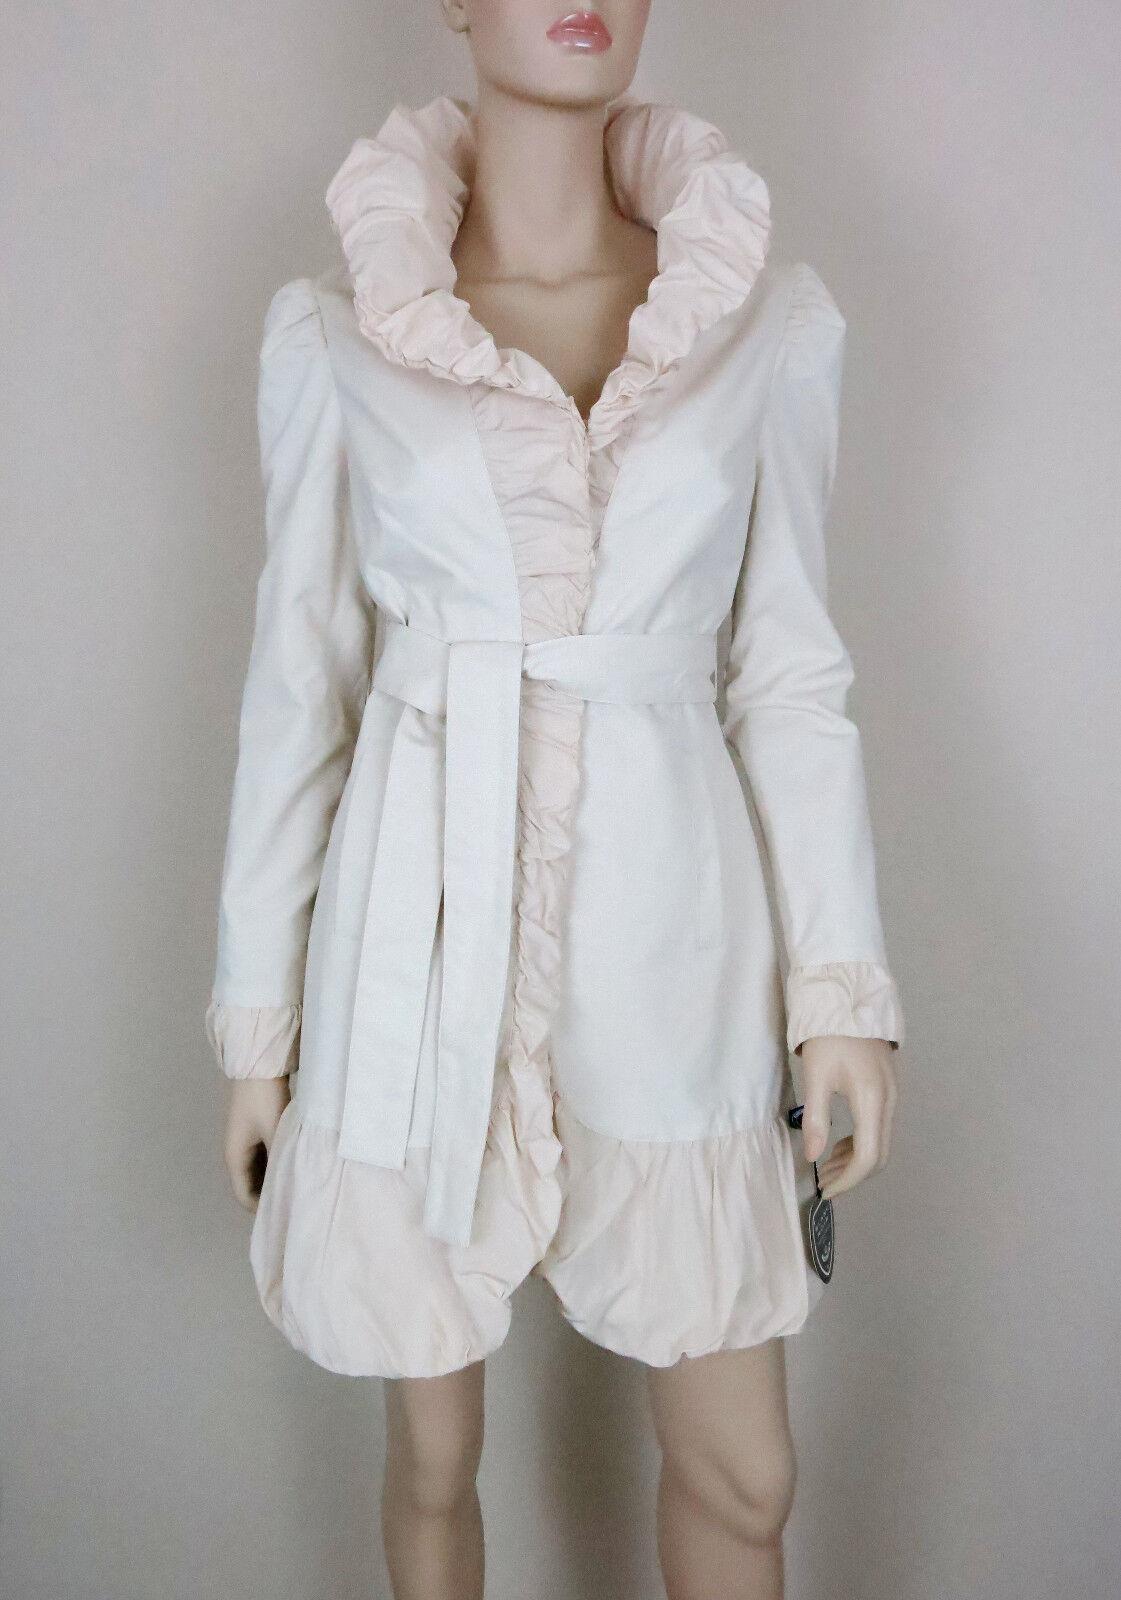 white black Coat Ruffle Bubble Trim Long Sleeve Tie Belt Cotton Blend Ivory M